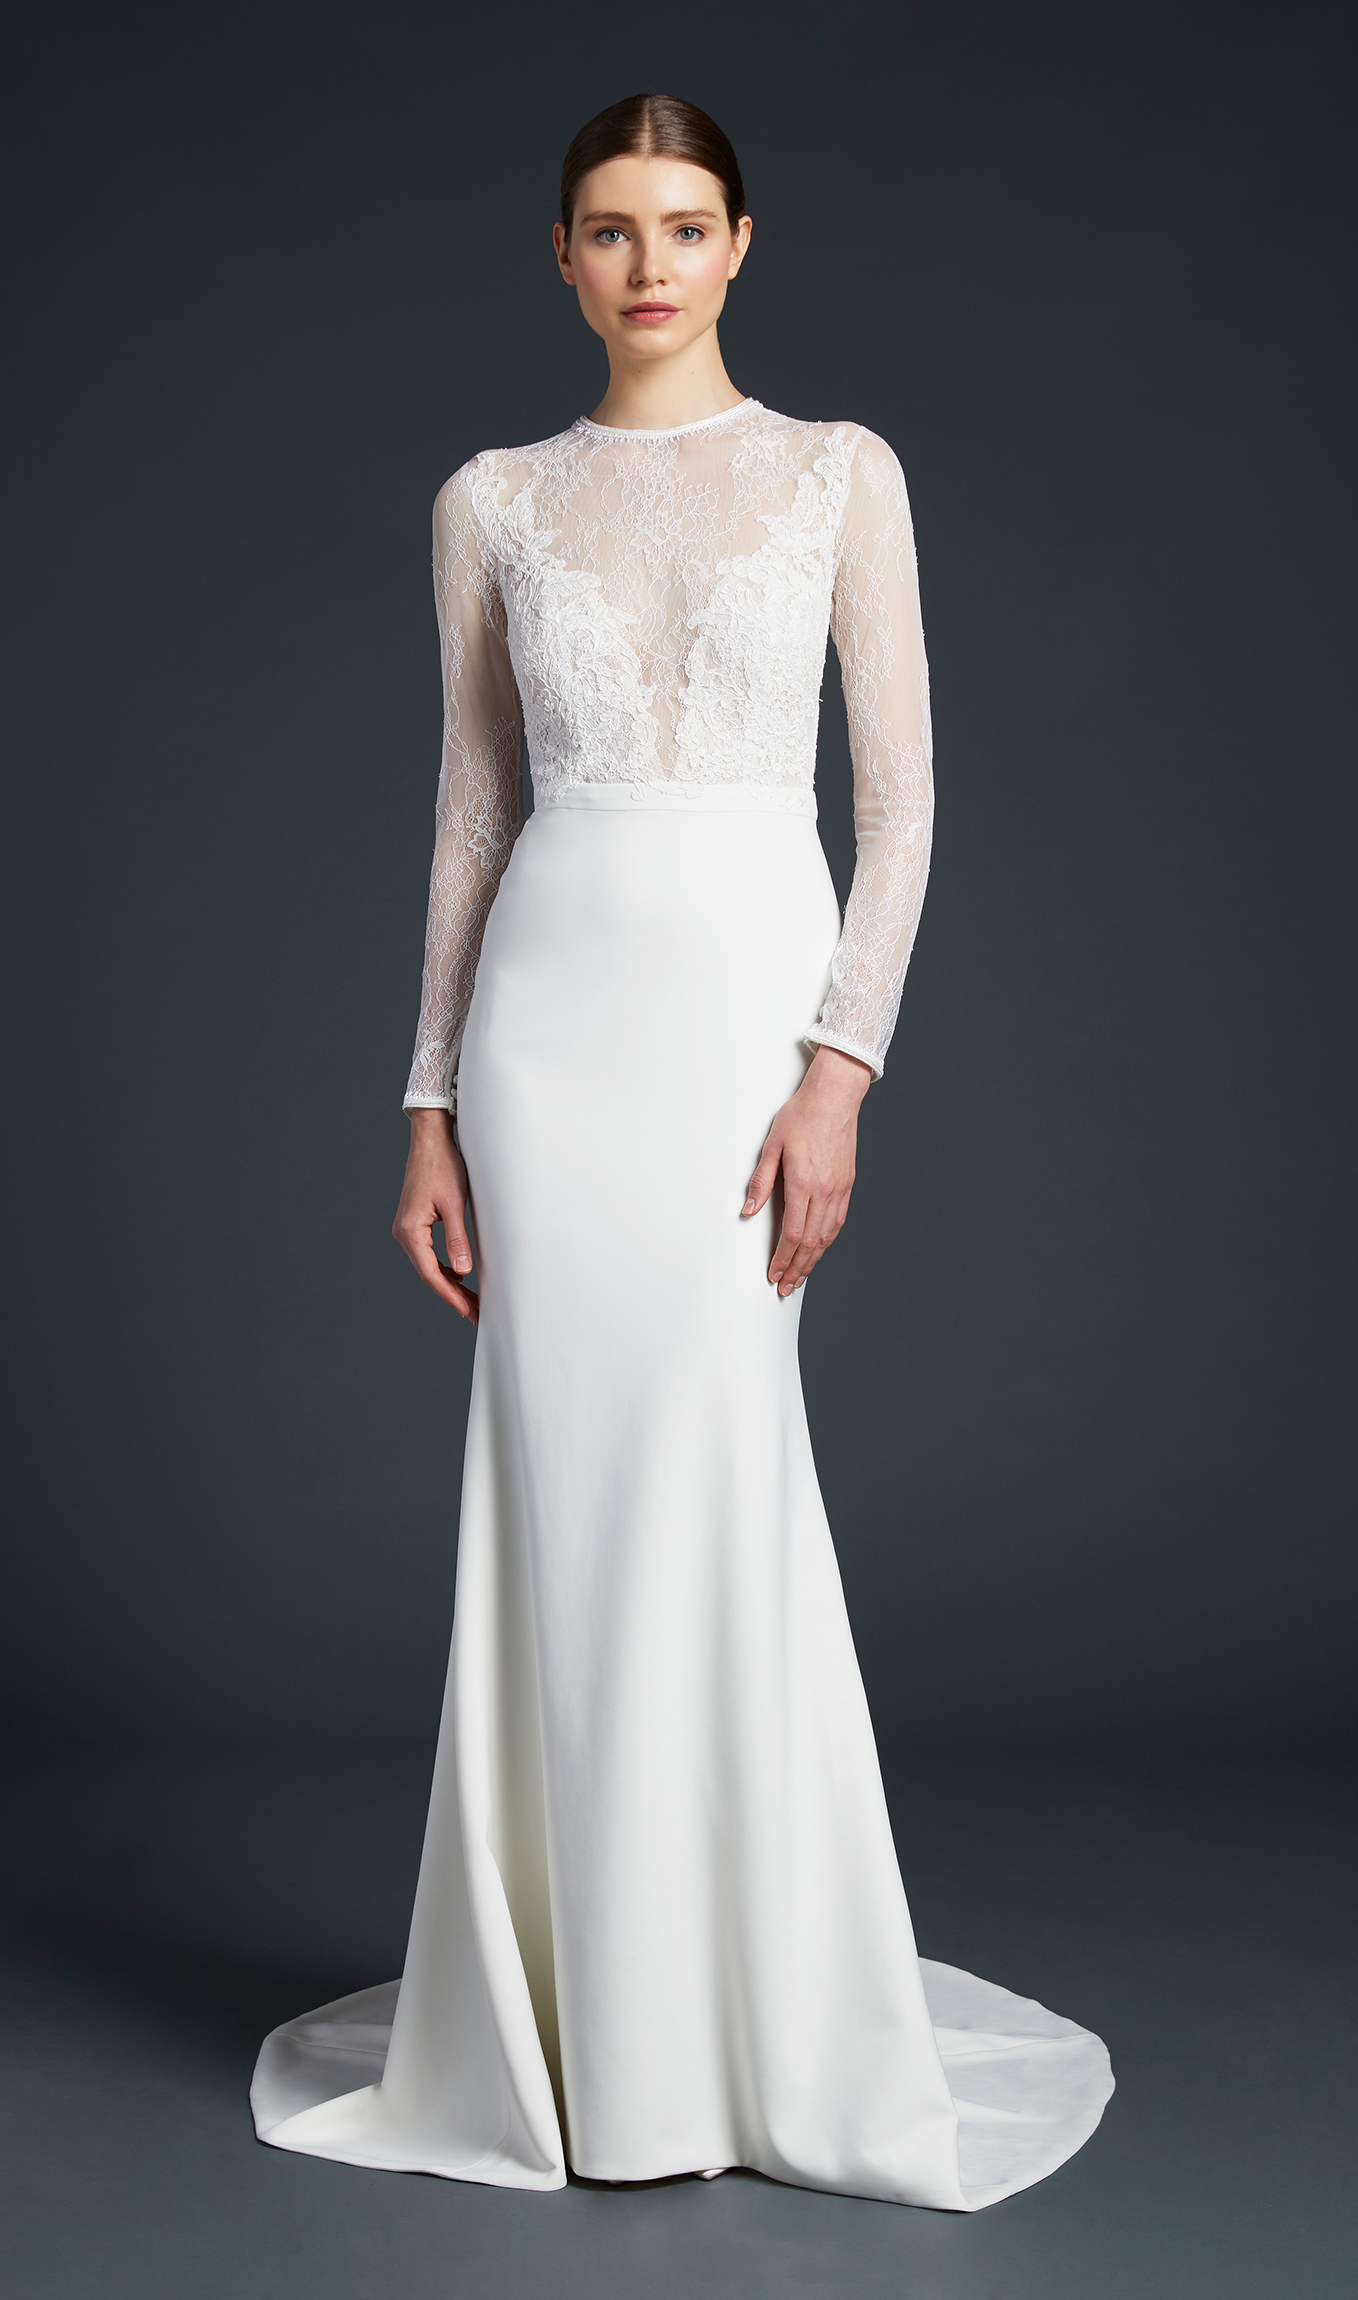 anne barge illusion sweetheart wedding dress fall 2019